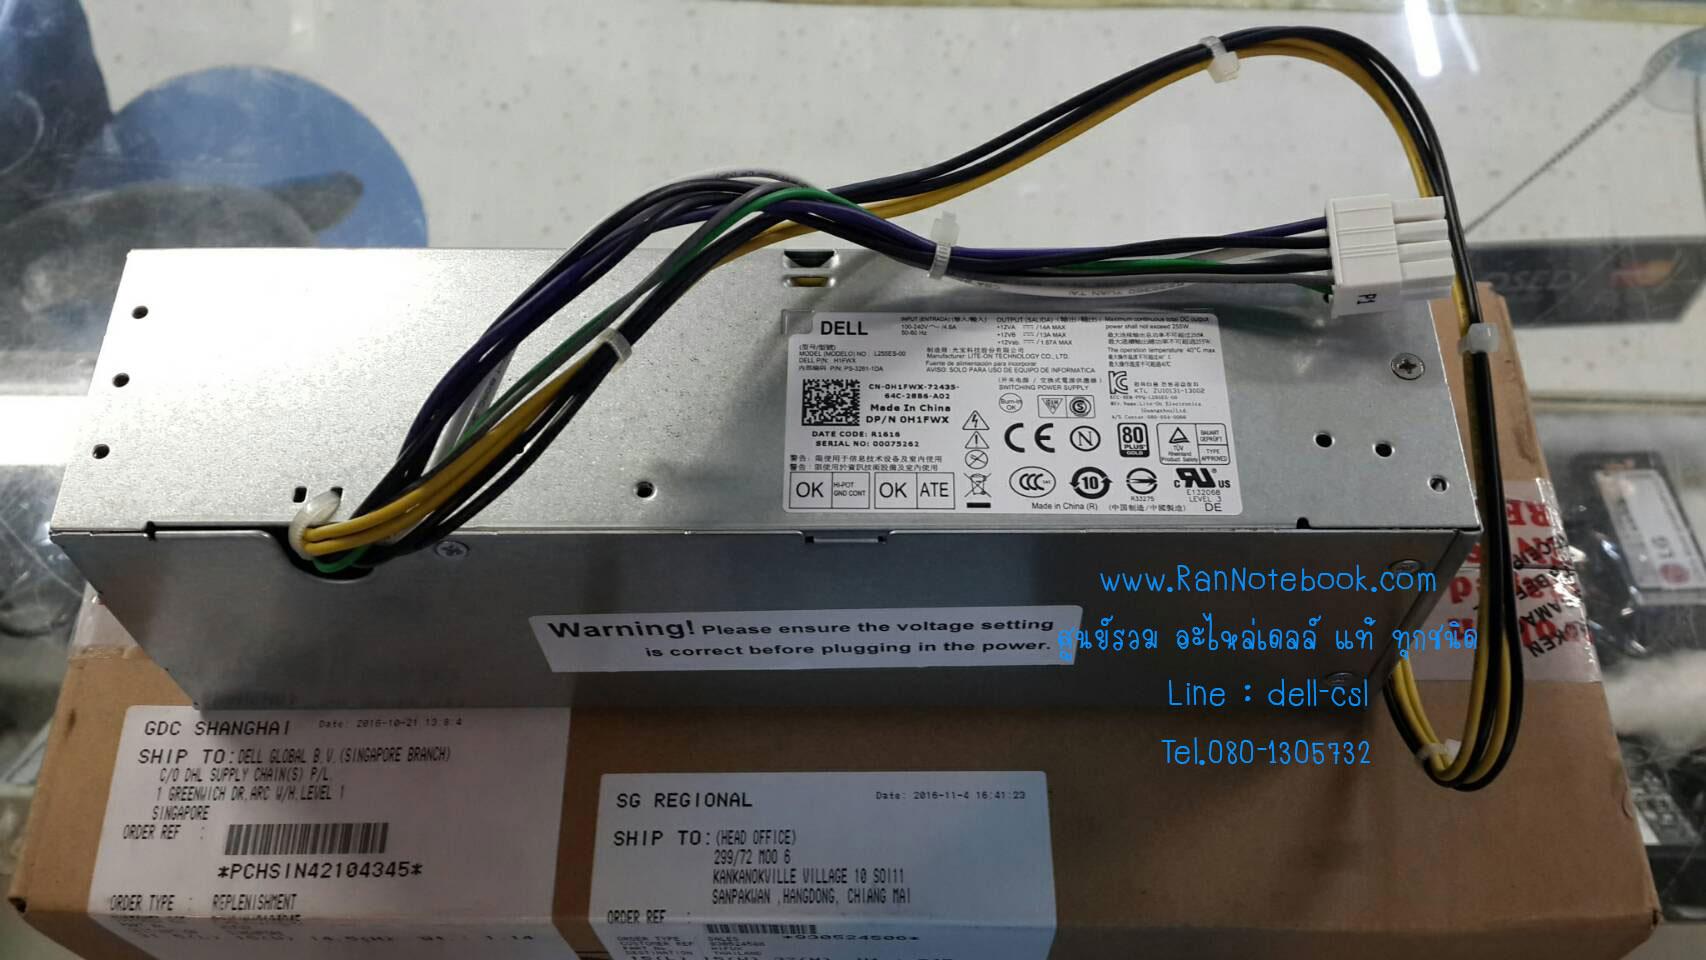 Power Supply DELL Optiplex 3020SFF 7020SFF 9020SFF ของแท้ ประกันศูนย์ DELL ราคา ไม่แพง